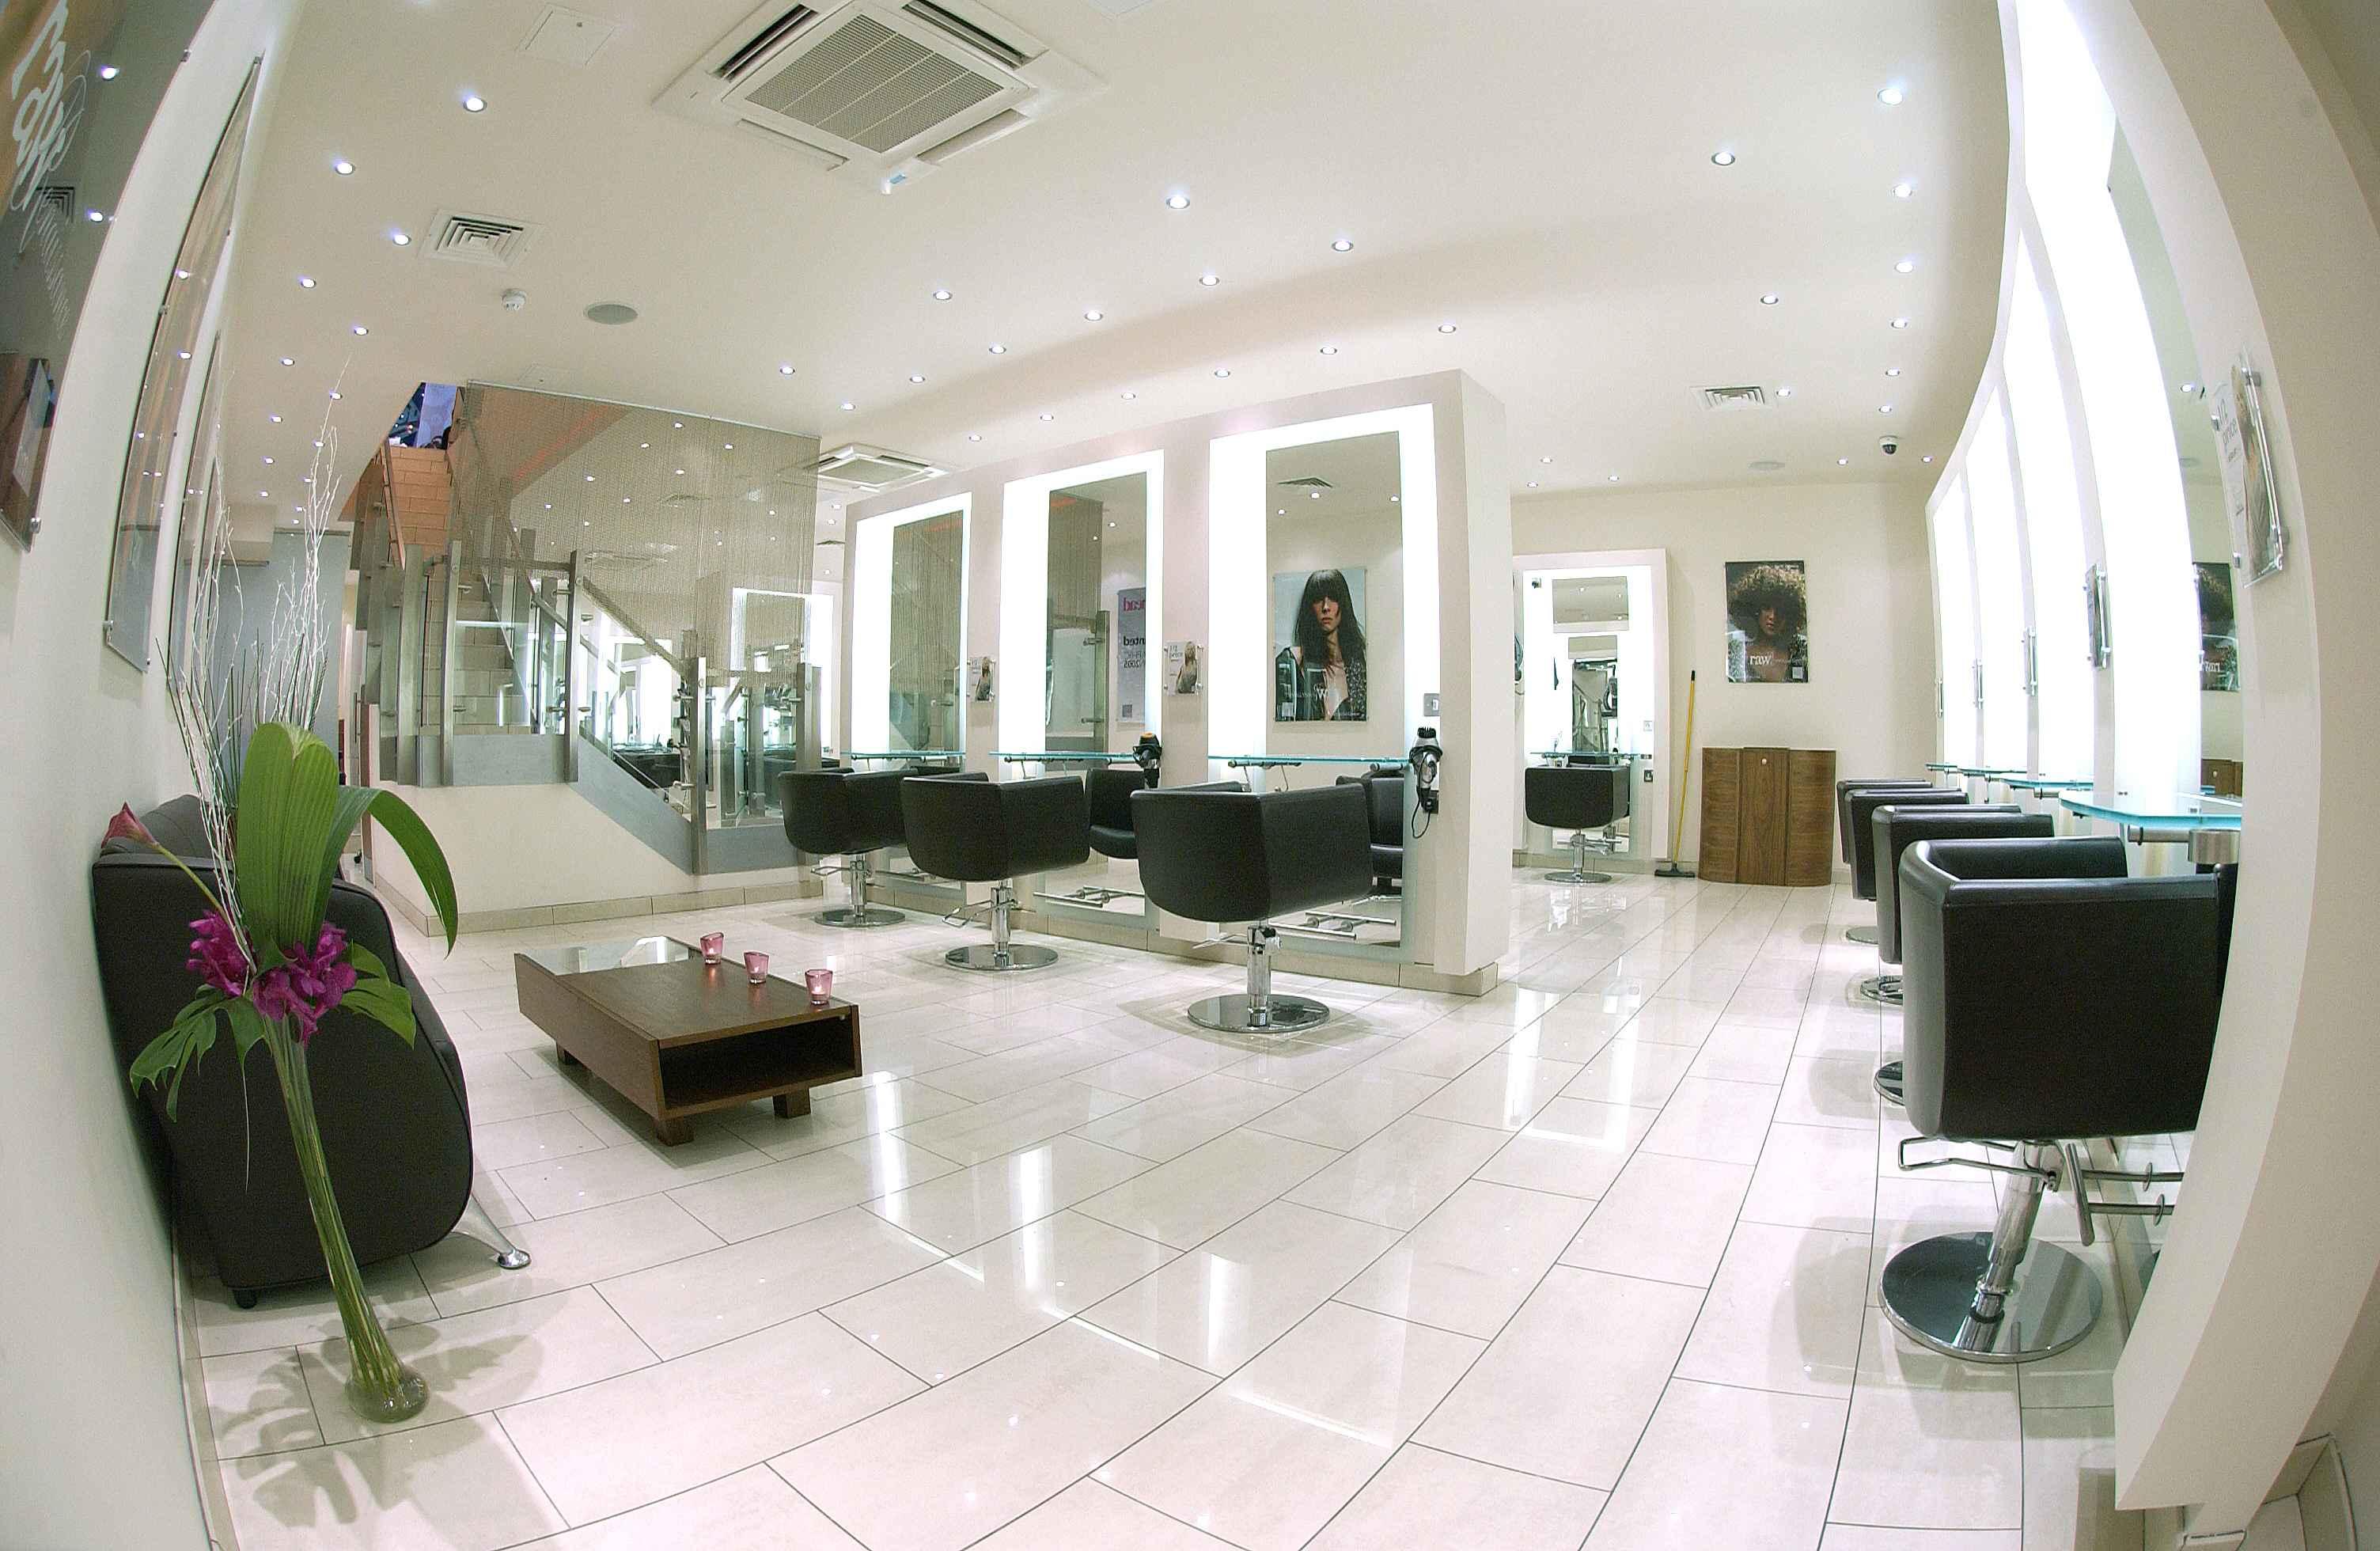 Headmasters Hair Salon, Mayfair, London - www.gentlemansbutler.com